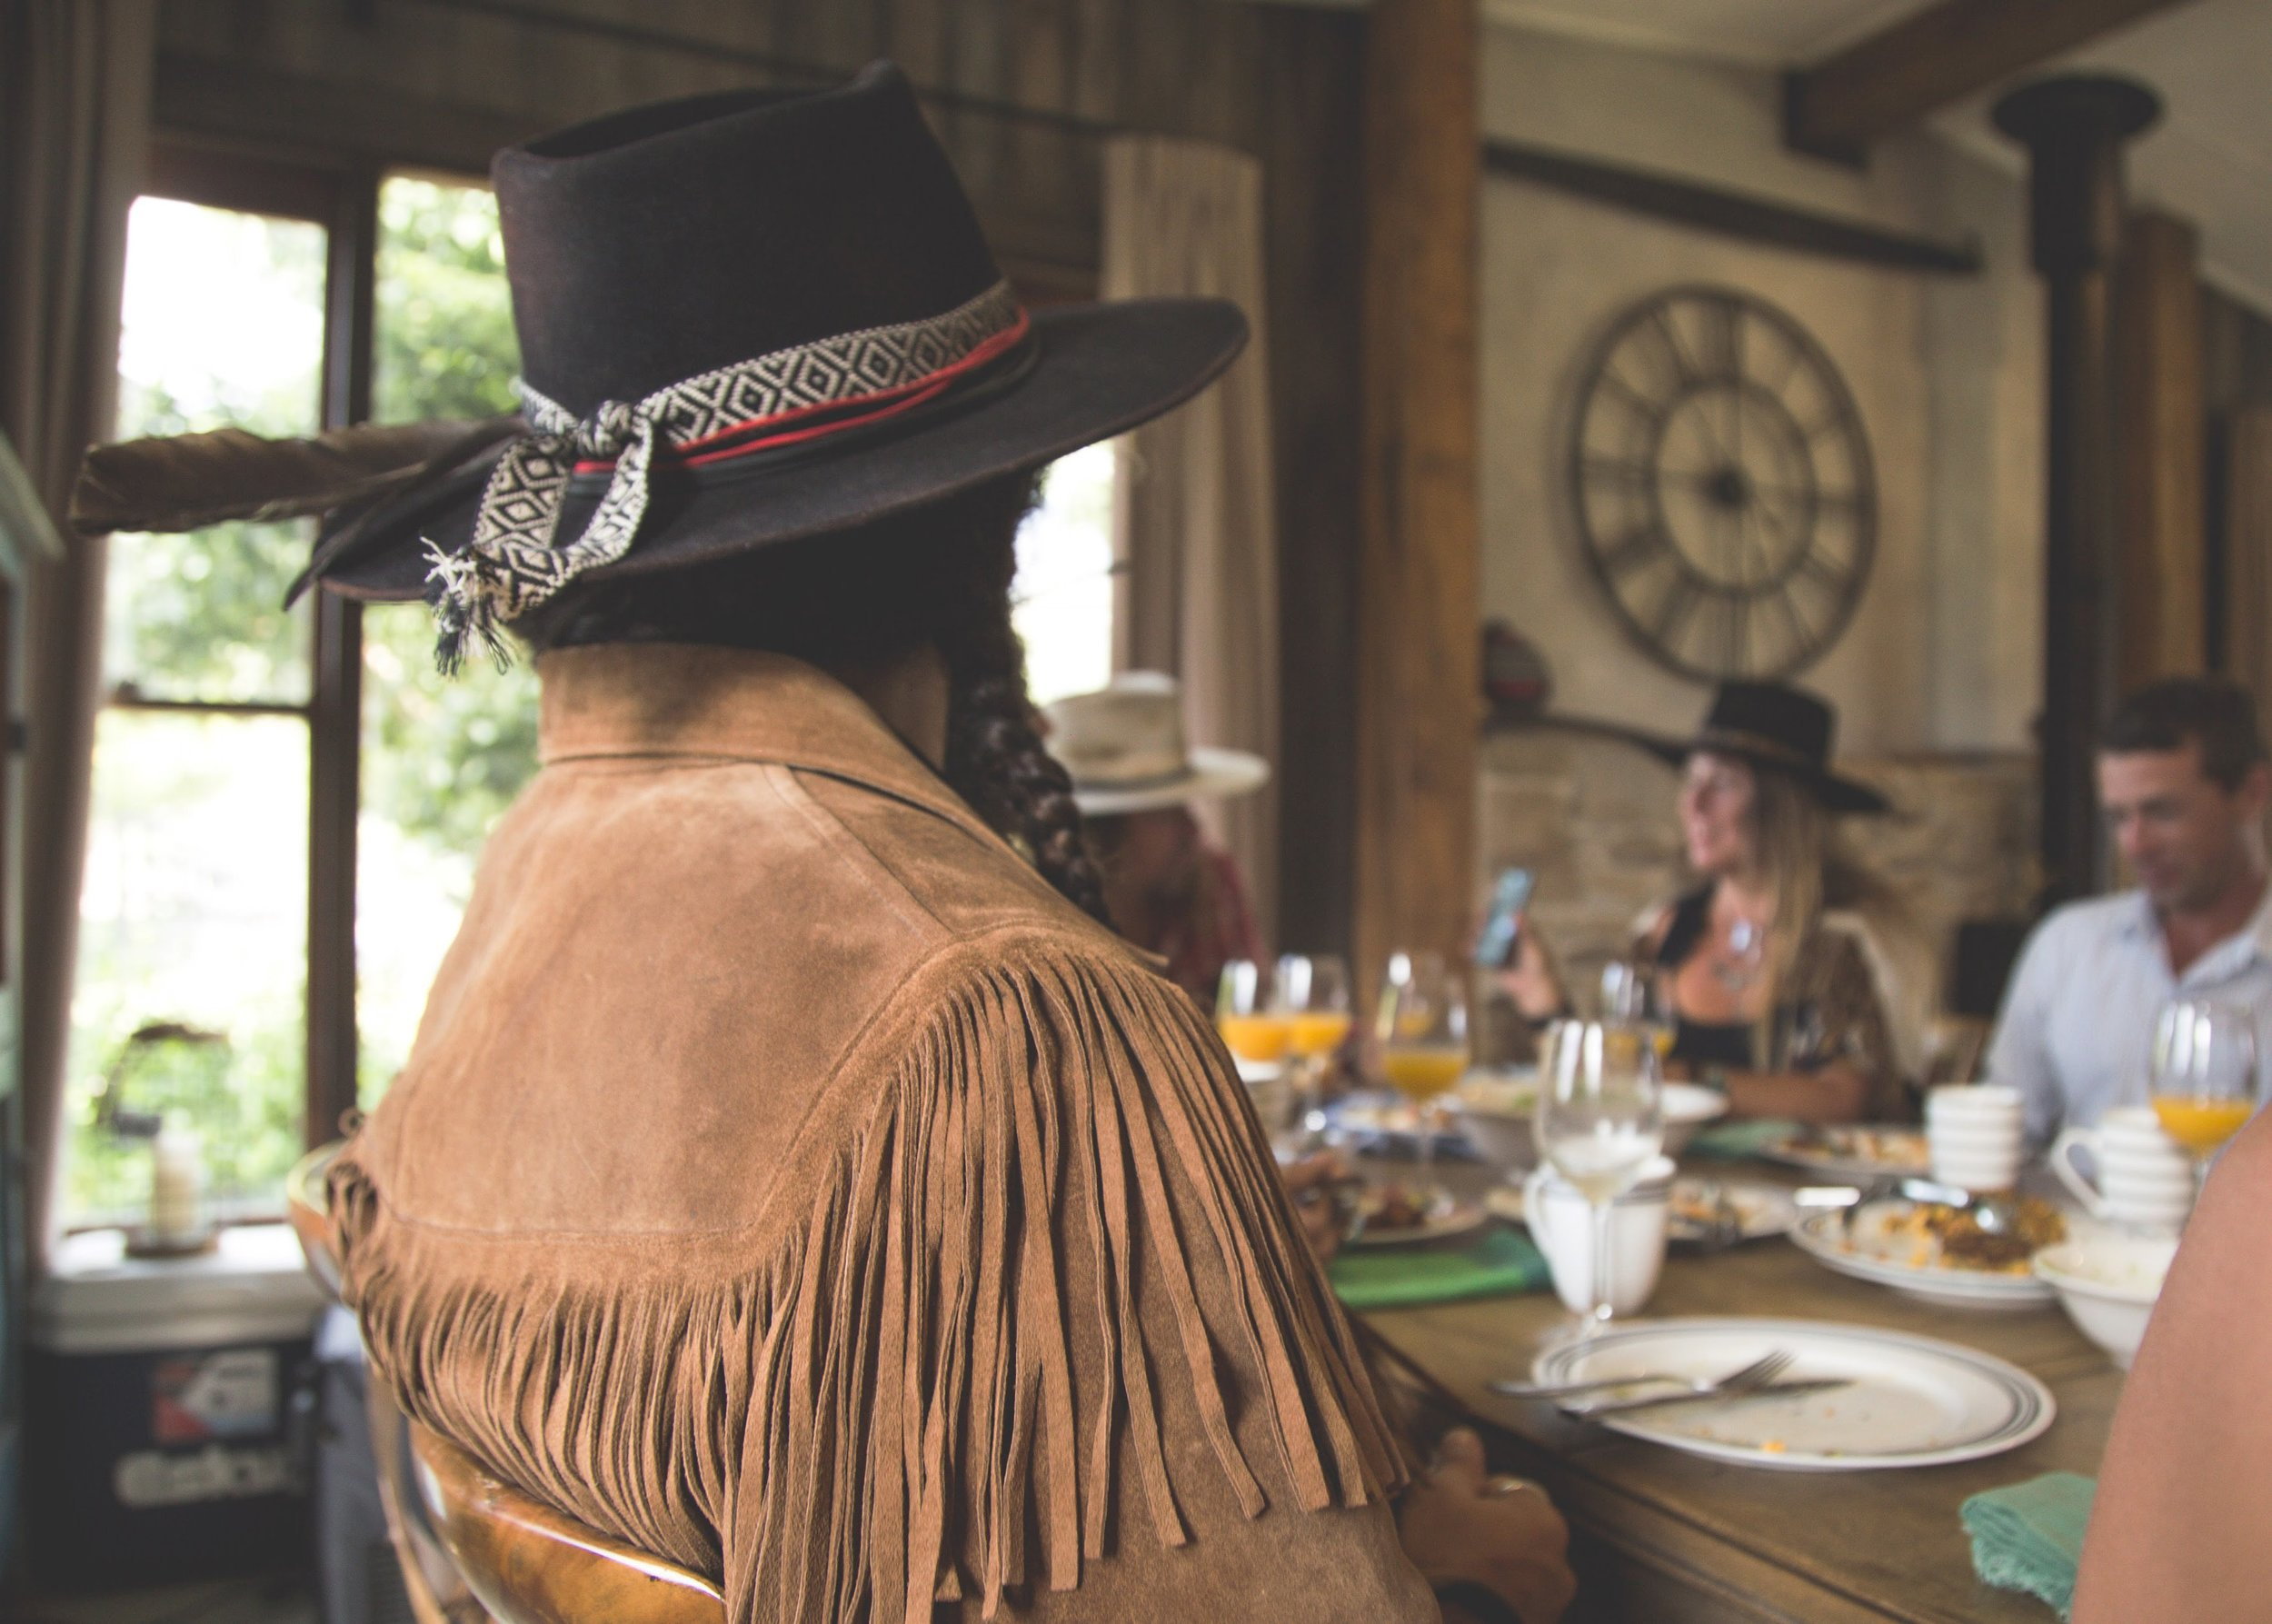 20180310_ABAdur_The Ranch Byron Bay New Edit_015.jpg